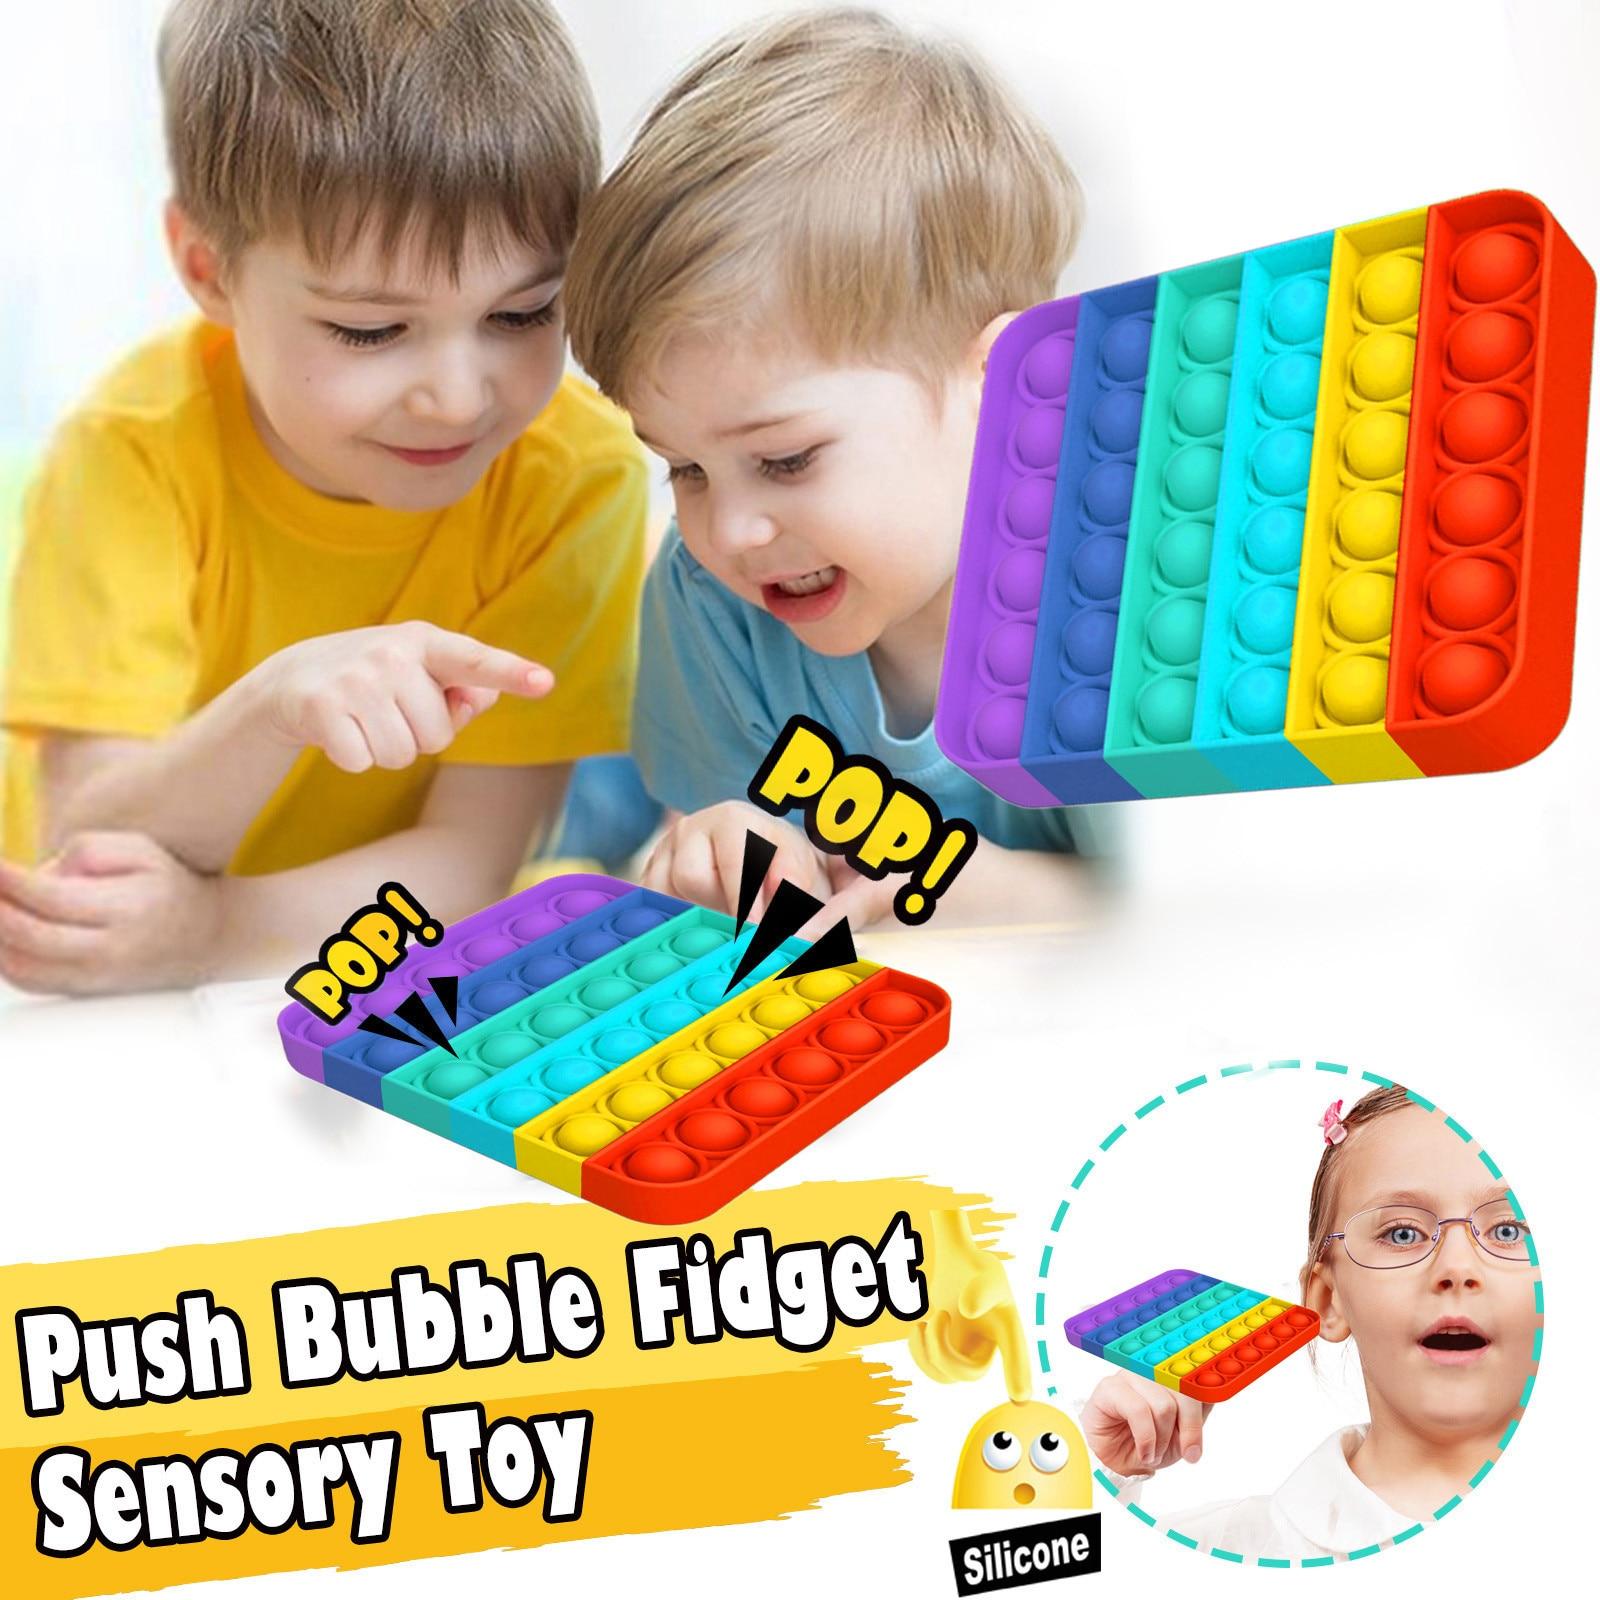 Fitget-Toys Sensory-Toy Autism Fidget Needs-Stress Pop-It-Game Push Bubble Reliever Popoit img2